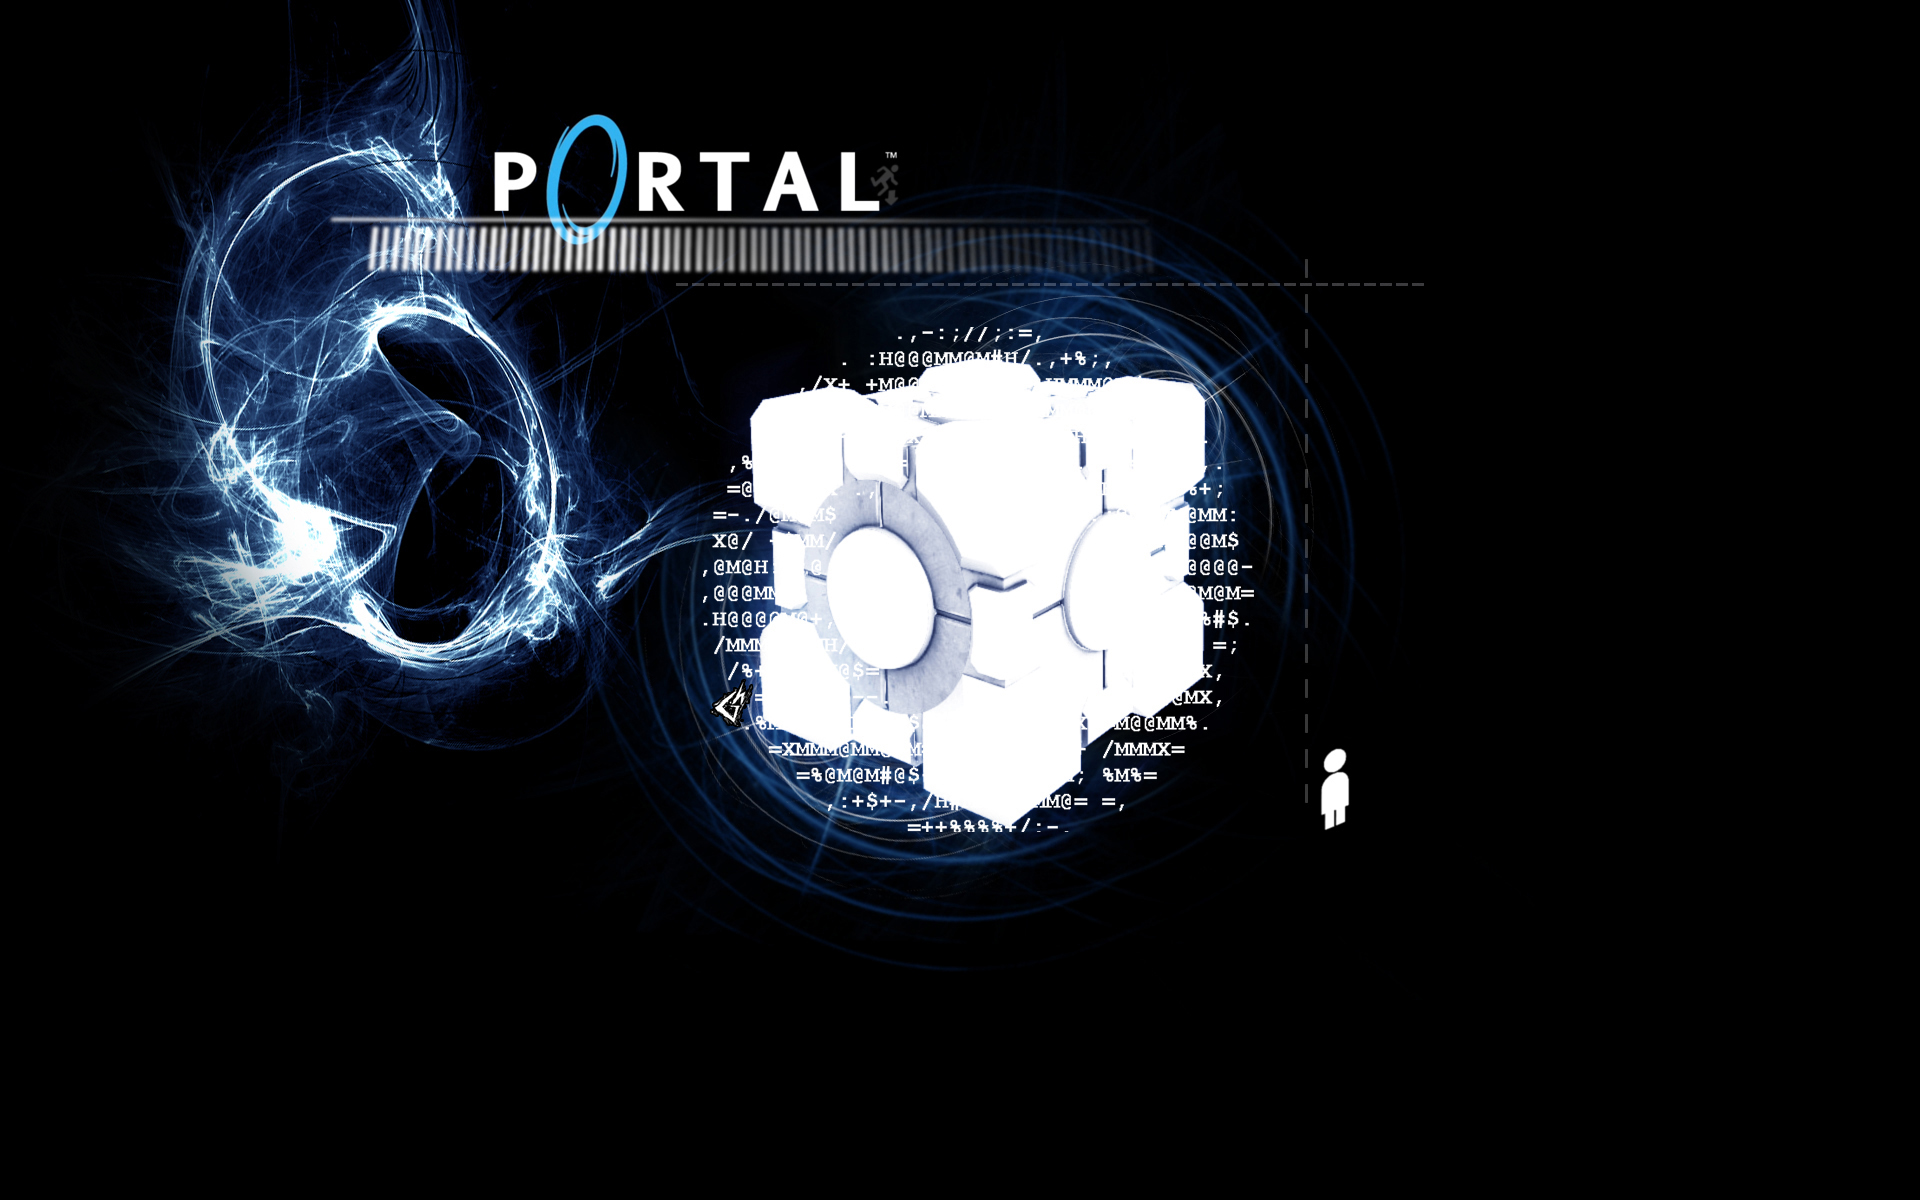 Portal Computer Wallpapers Desktop Backgrounds 1920x1200 ID42405 1920x1200